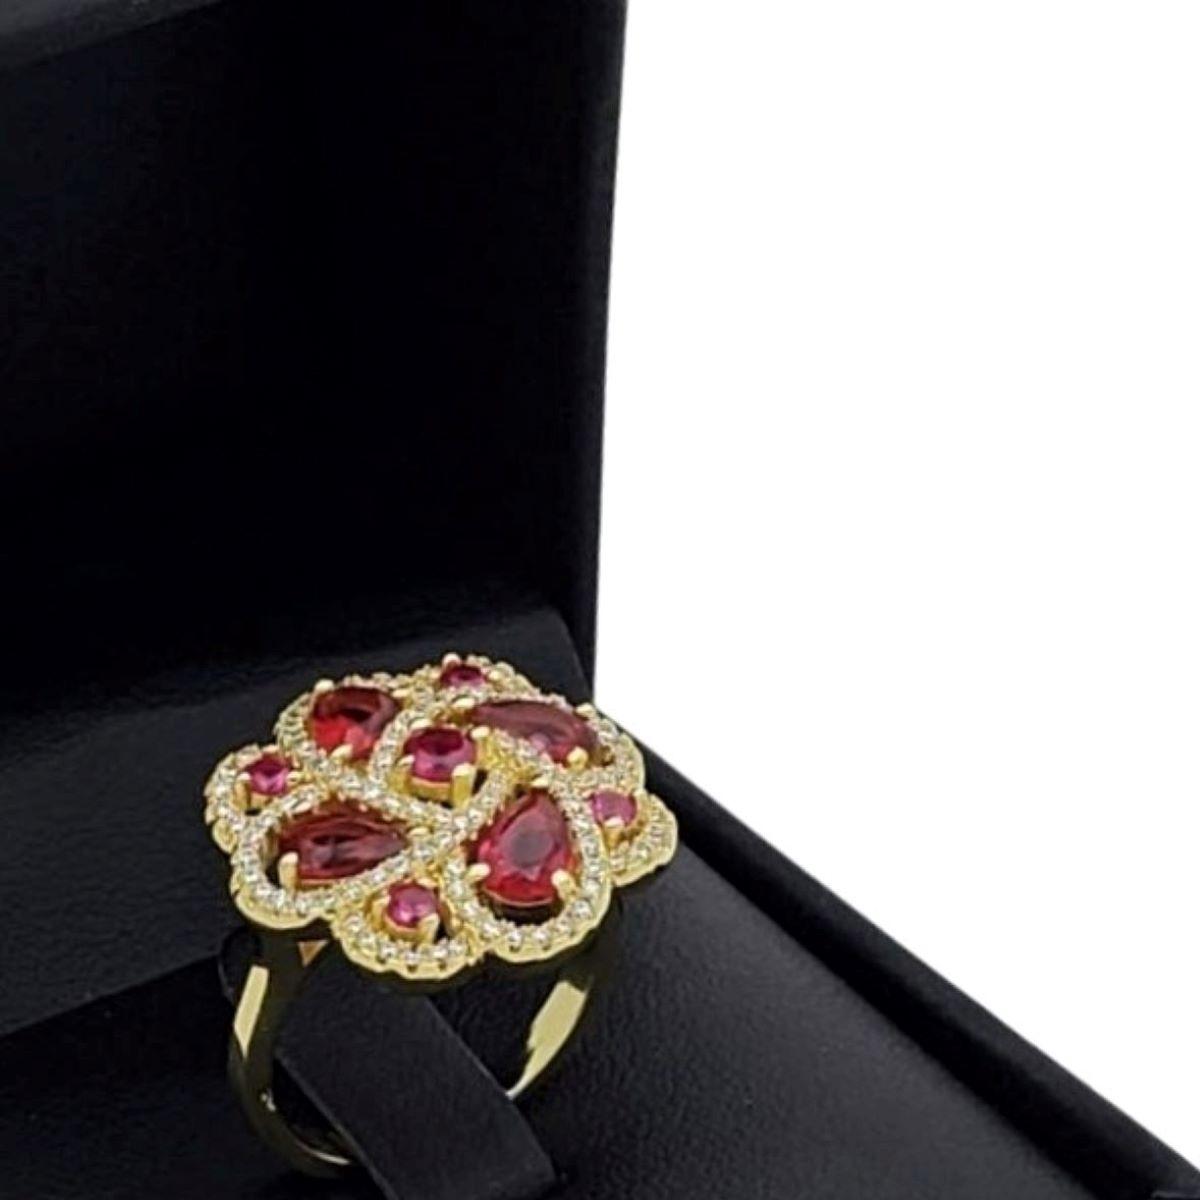 Anel Flor Pink Rubelita Cravejado Banho De Ouro 18k 2399